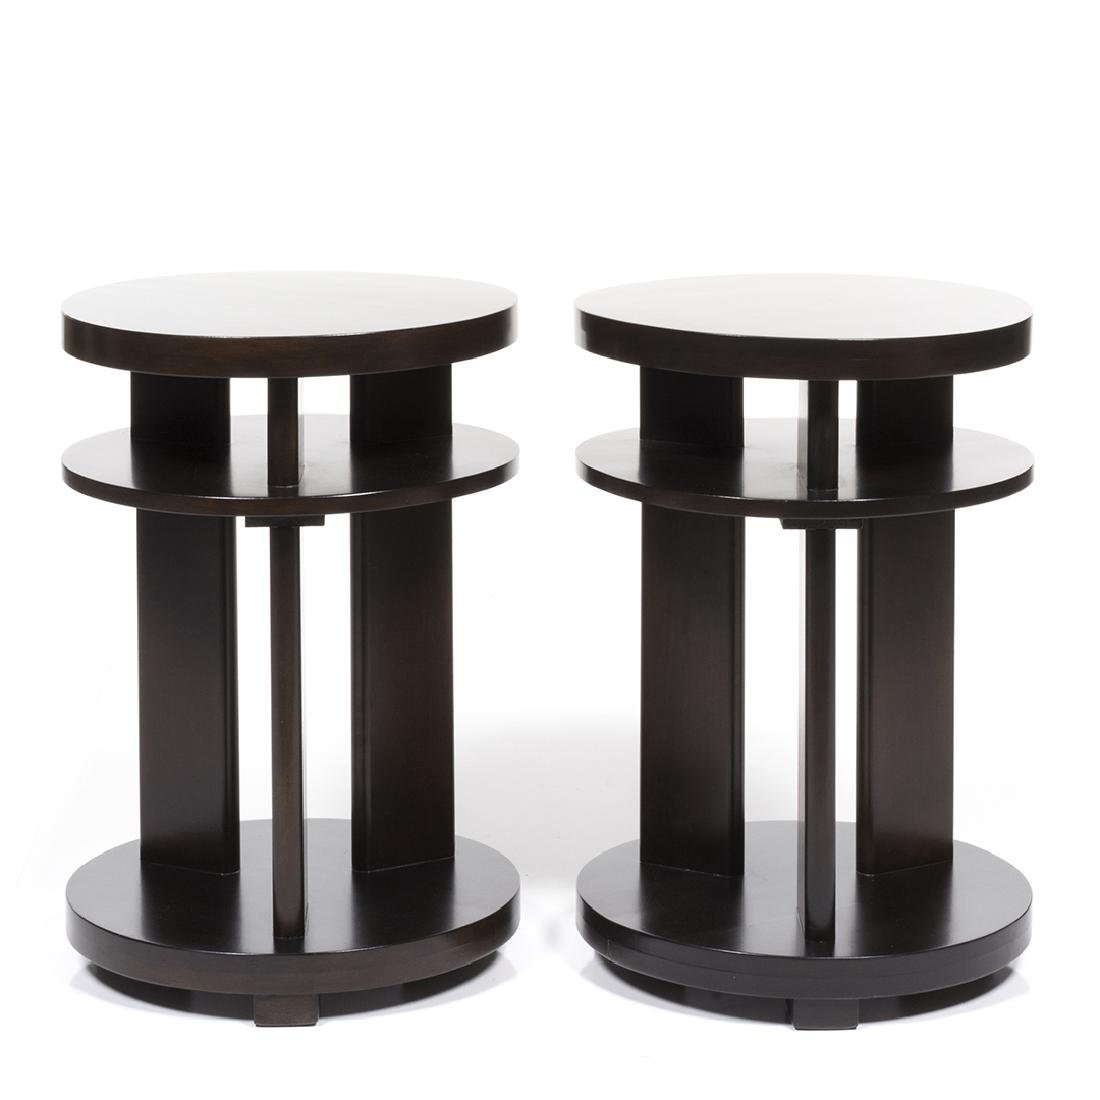 Paul Laszlo Side Tables (2) - 3